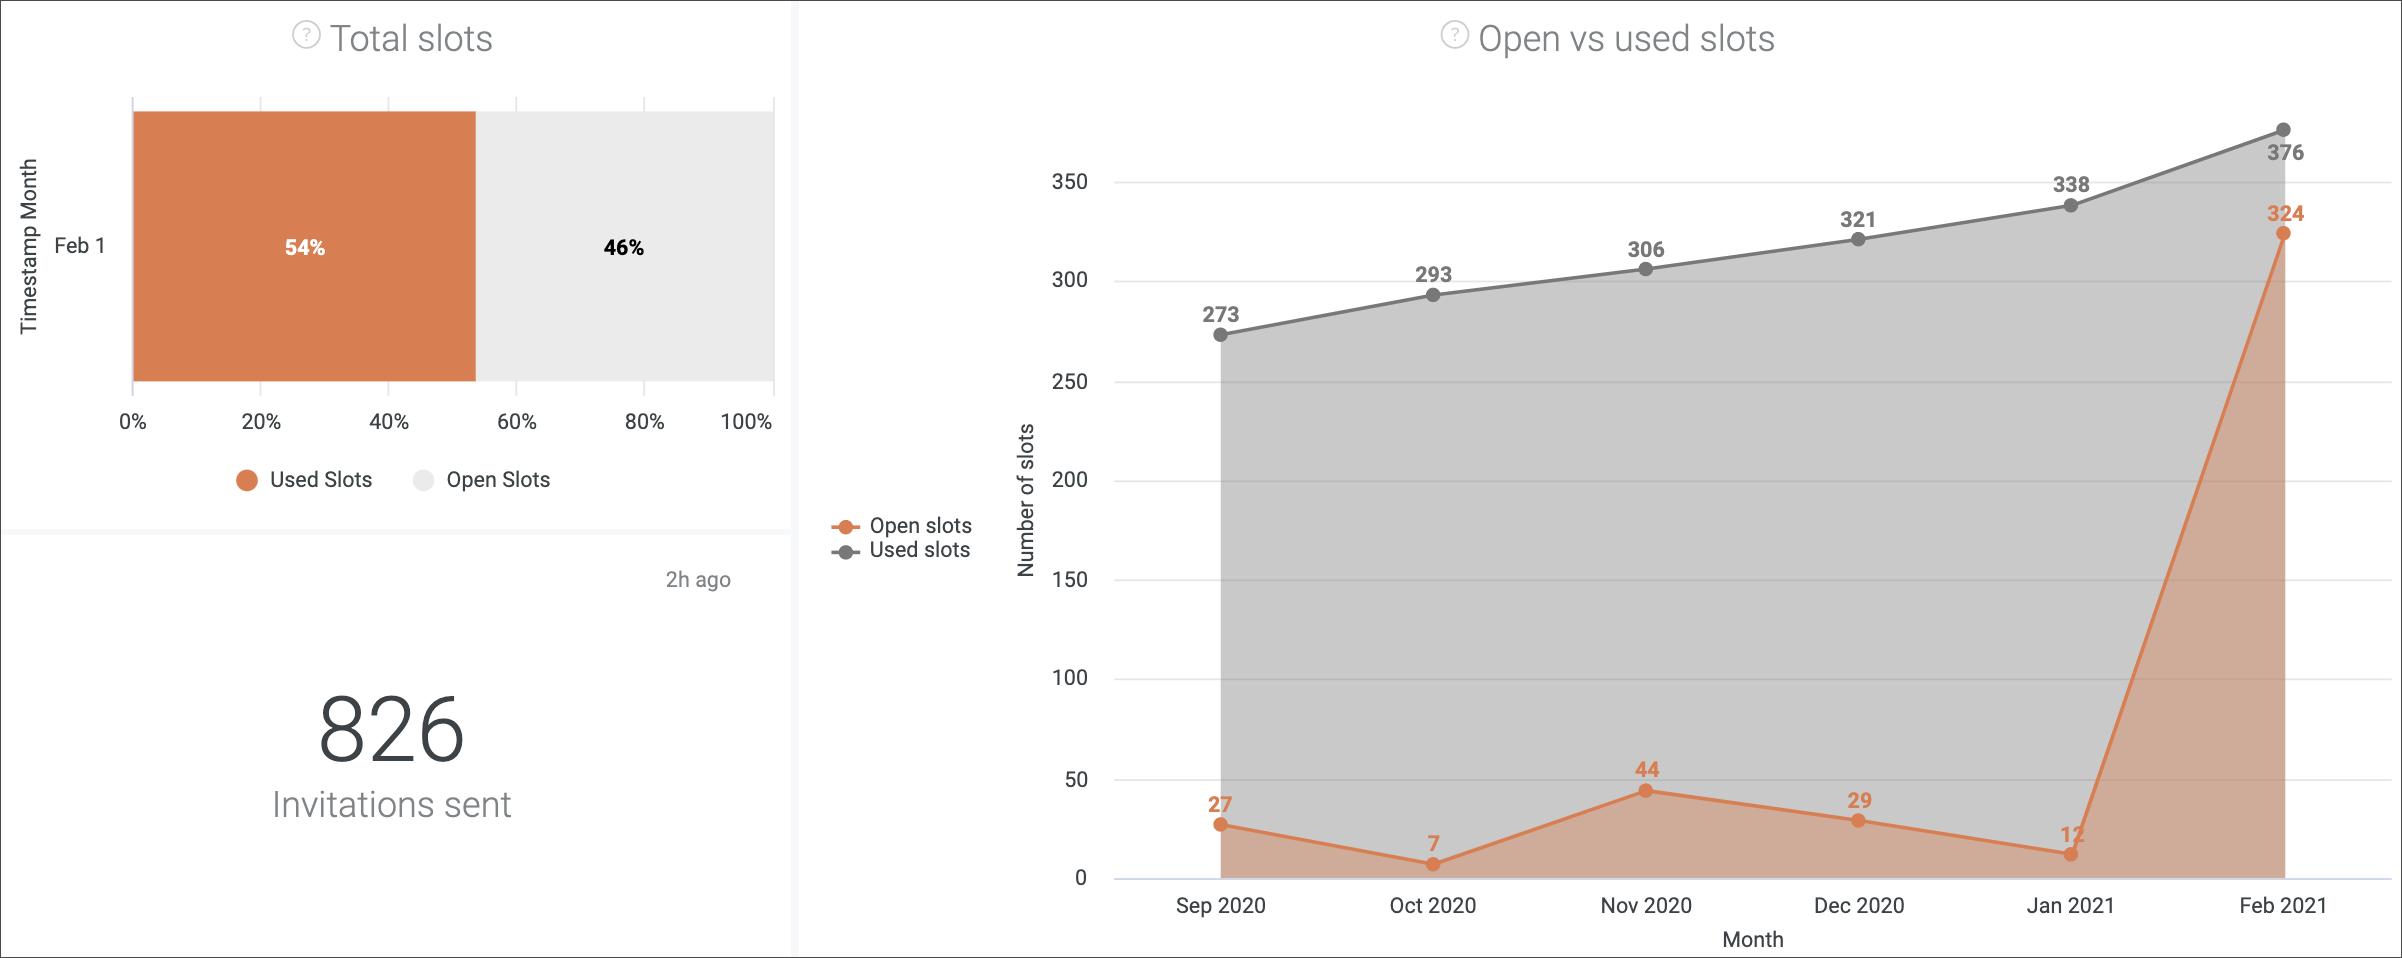 open vs used slots